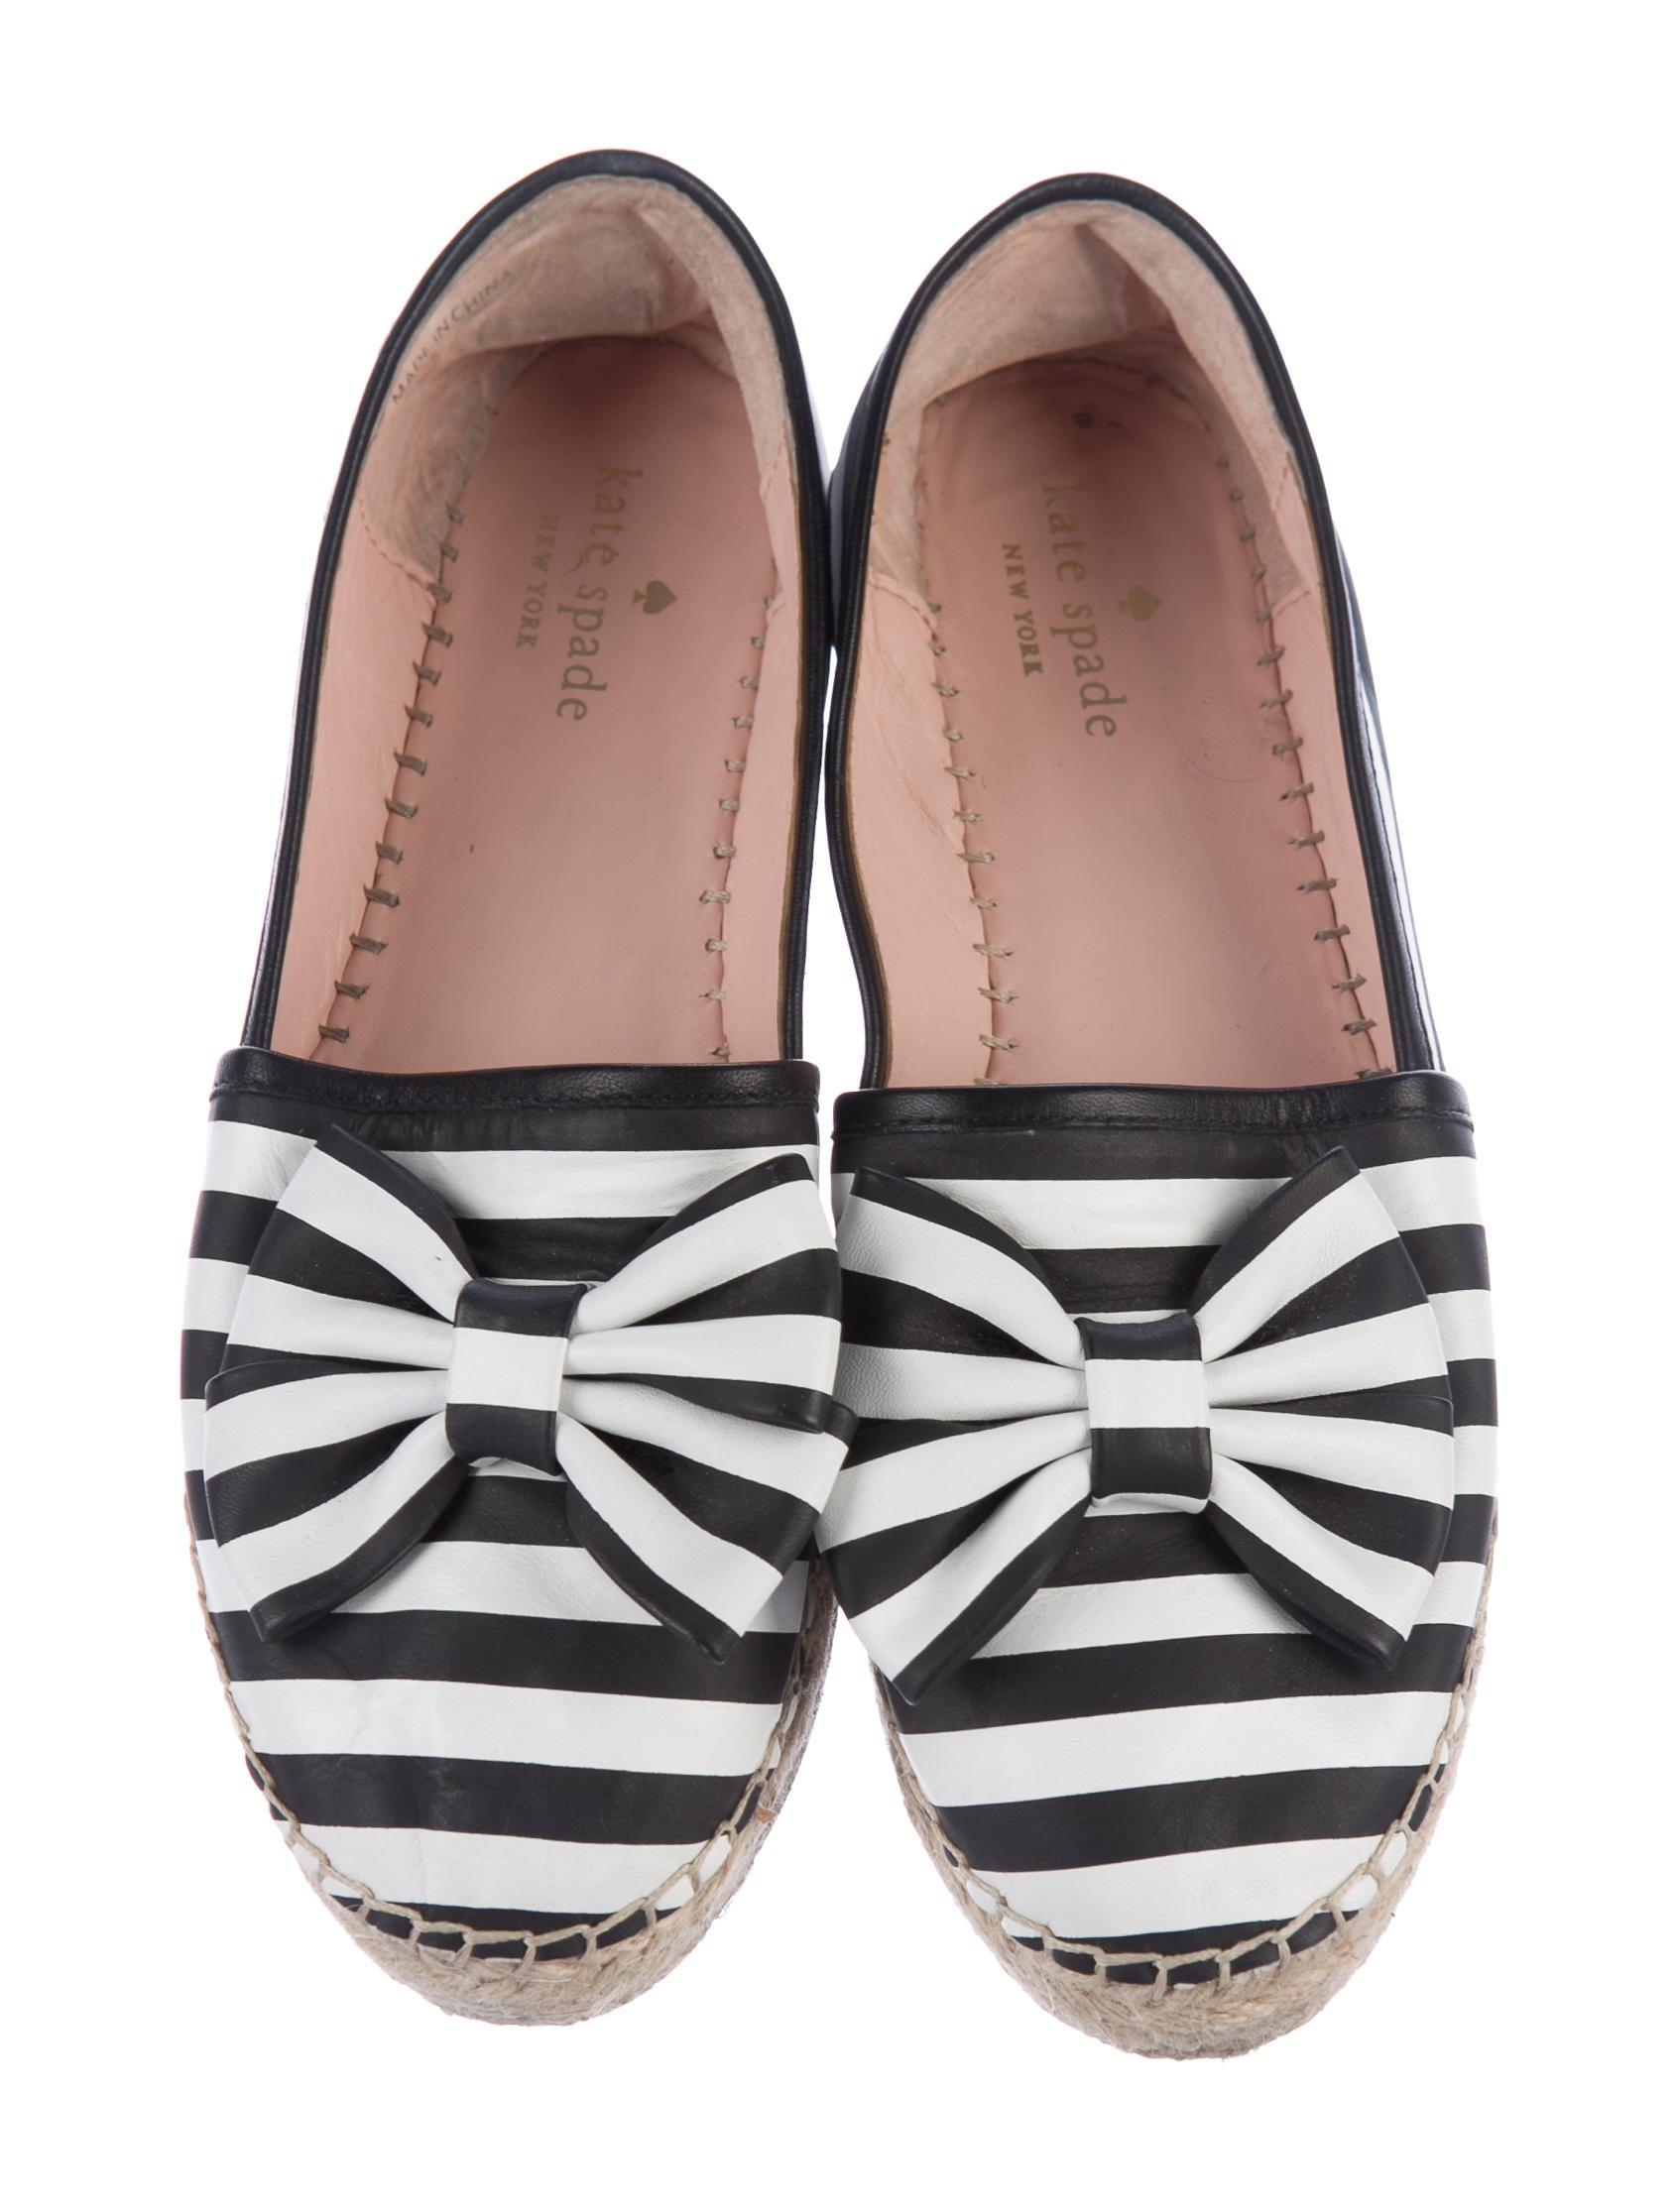 Kate spade new york leather espadrille flats shoes for Kate spade new york flats